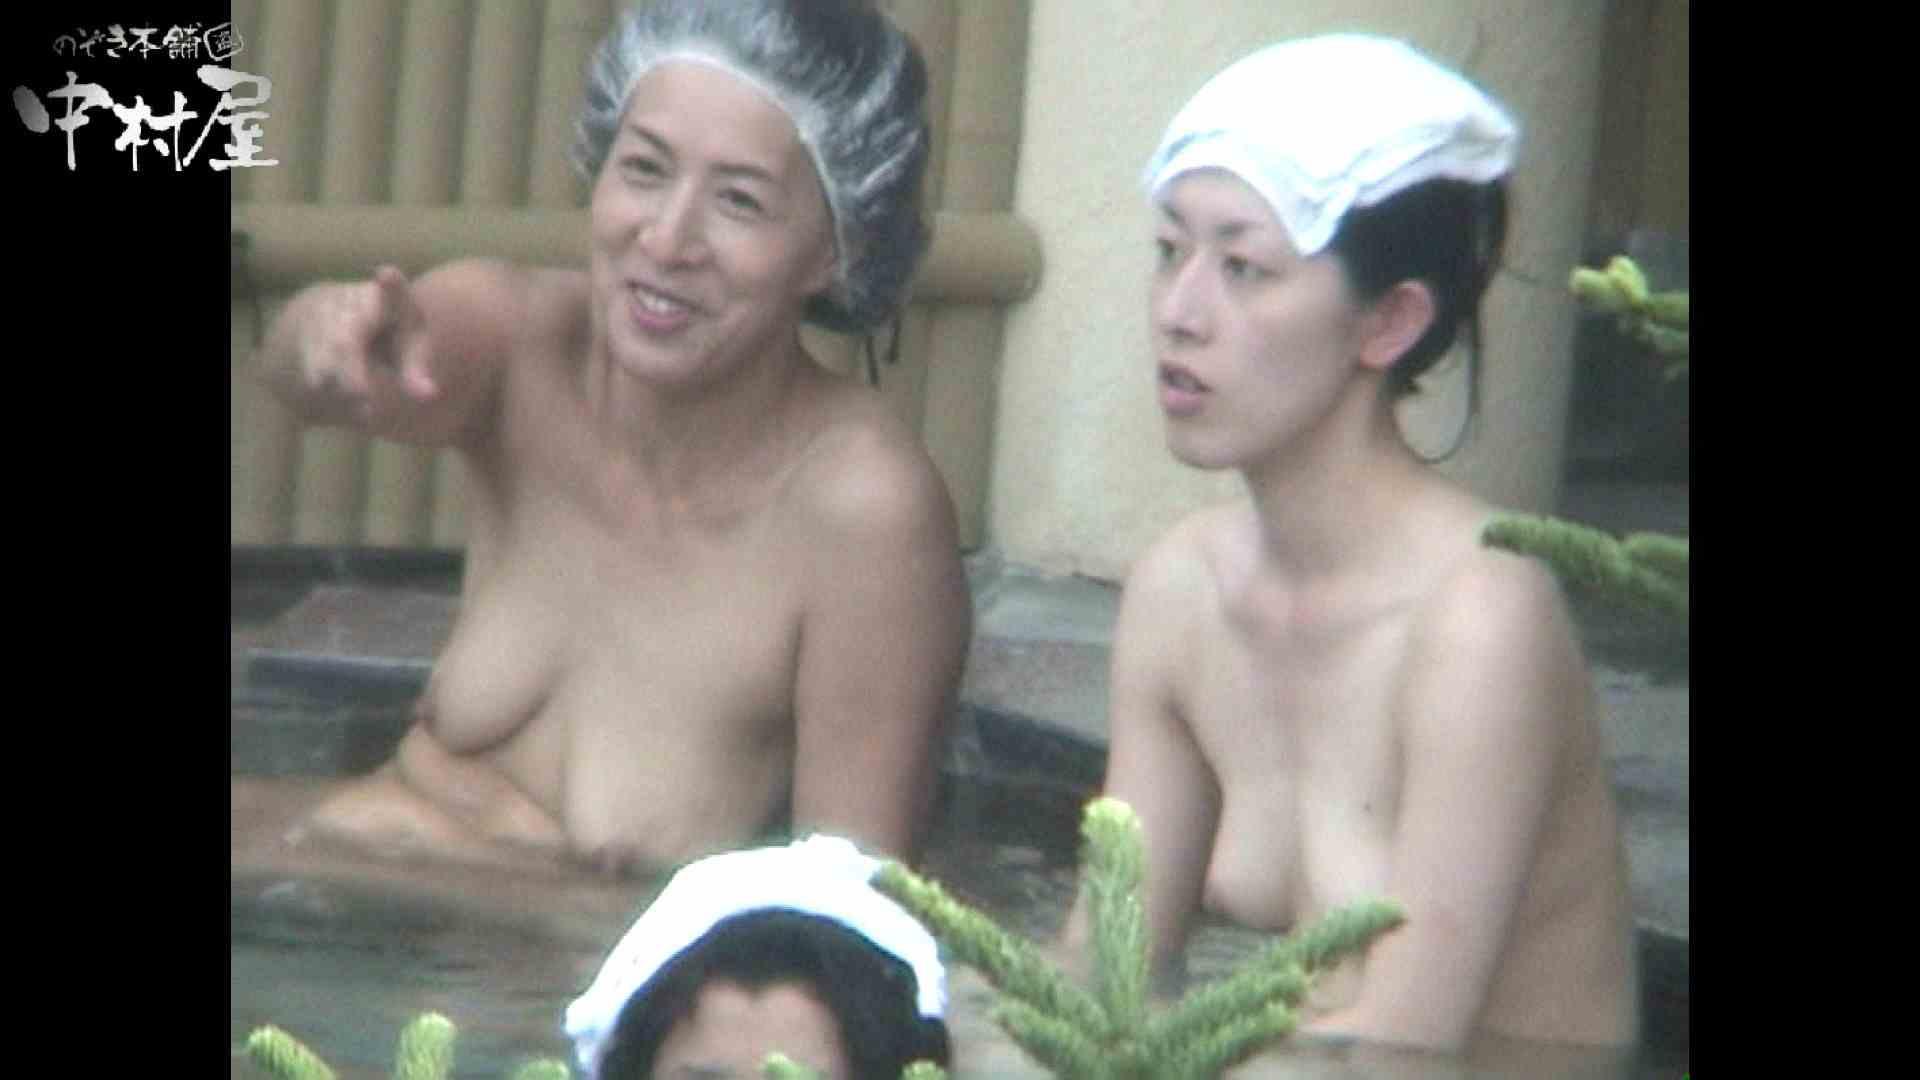 Aquaな露天風呂Vol.960 OLセックス 盗撮セックス無修正動画無料 65画像 20